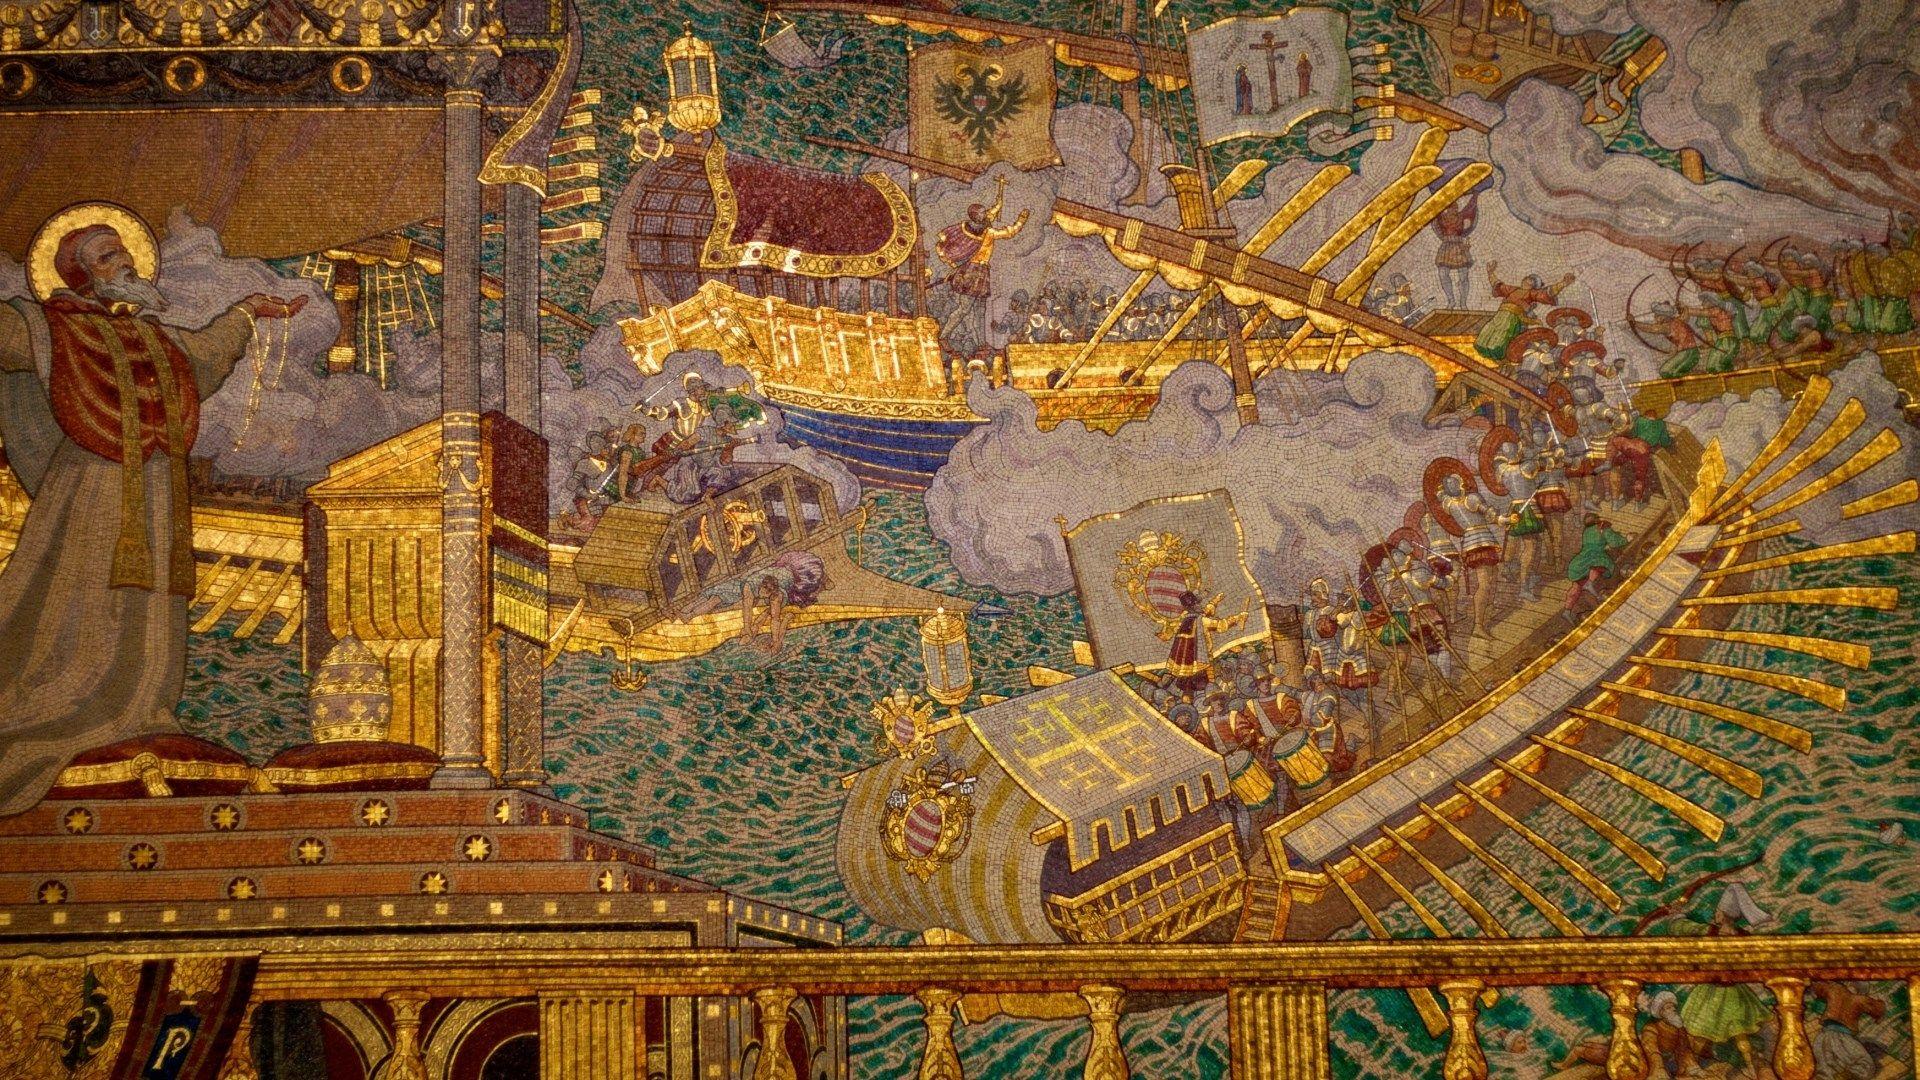 2017-03-15 - widescreen wallpaper basilica of notre dame de fourvire - #1878716